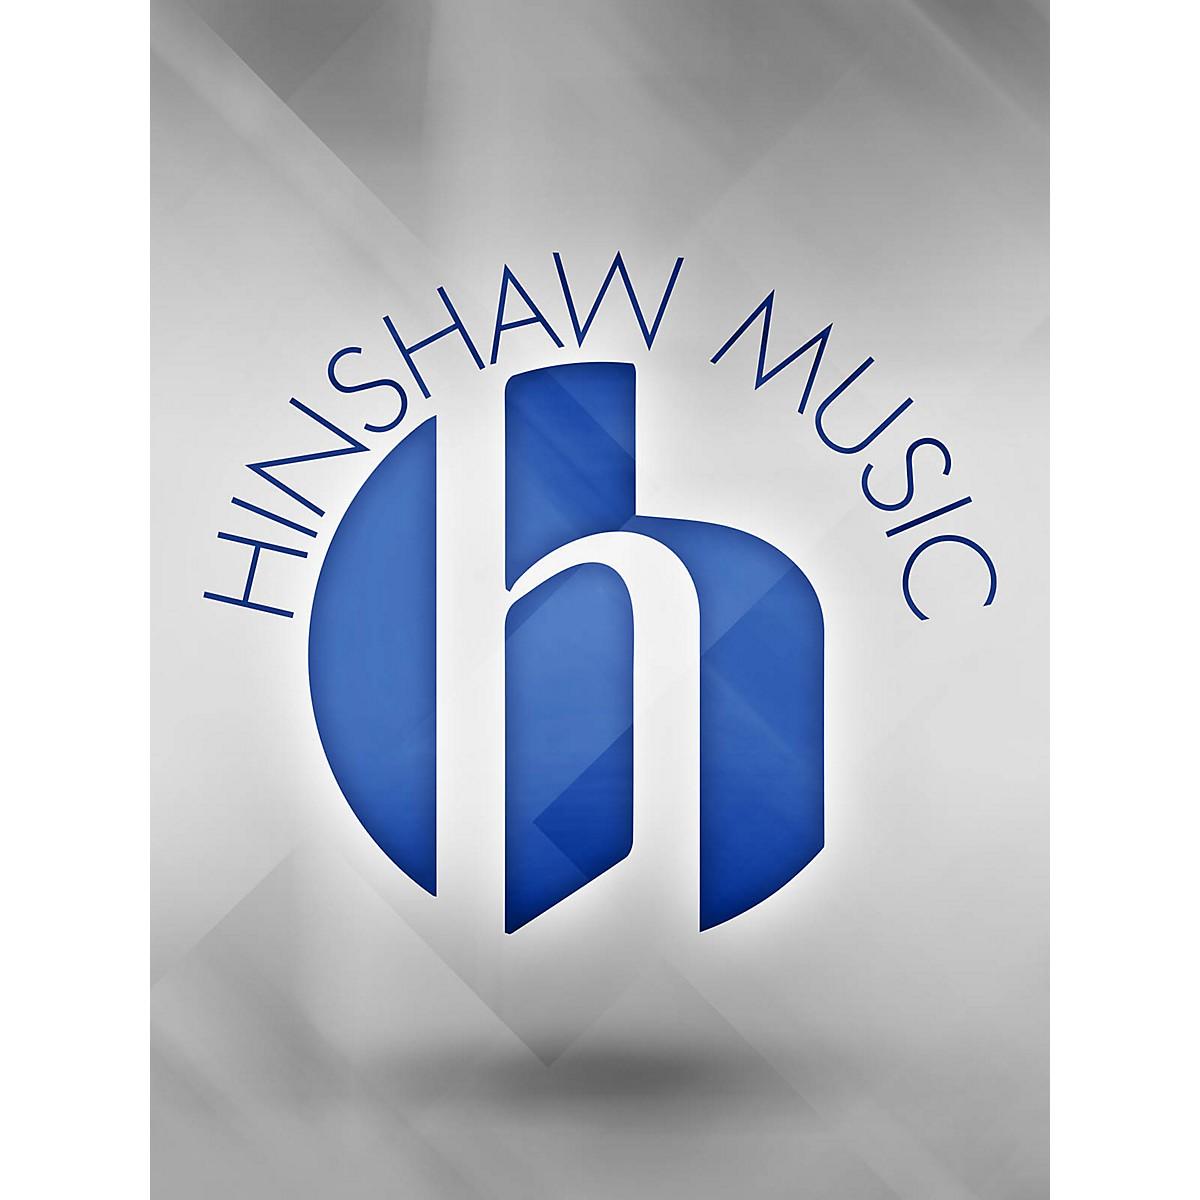 Hinshaw Music Prayer for Peace UNIS